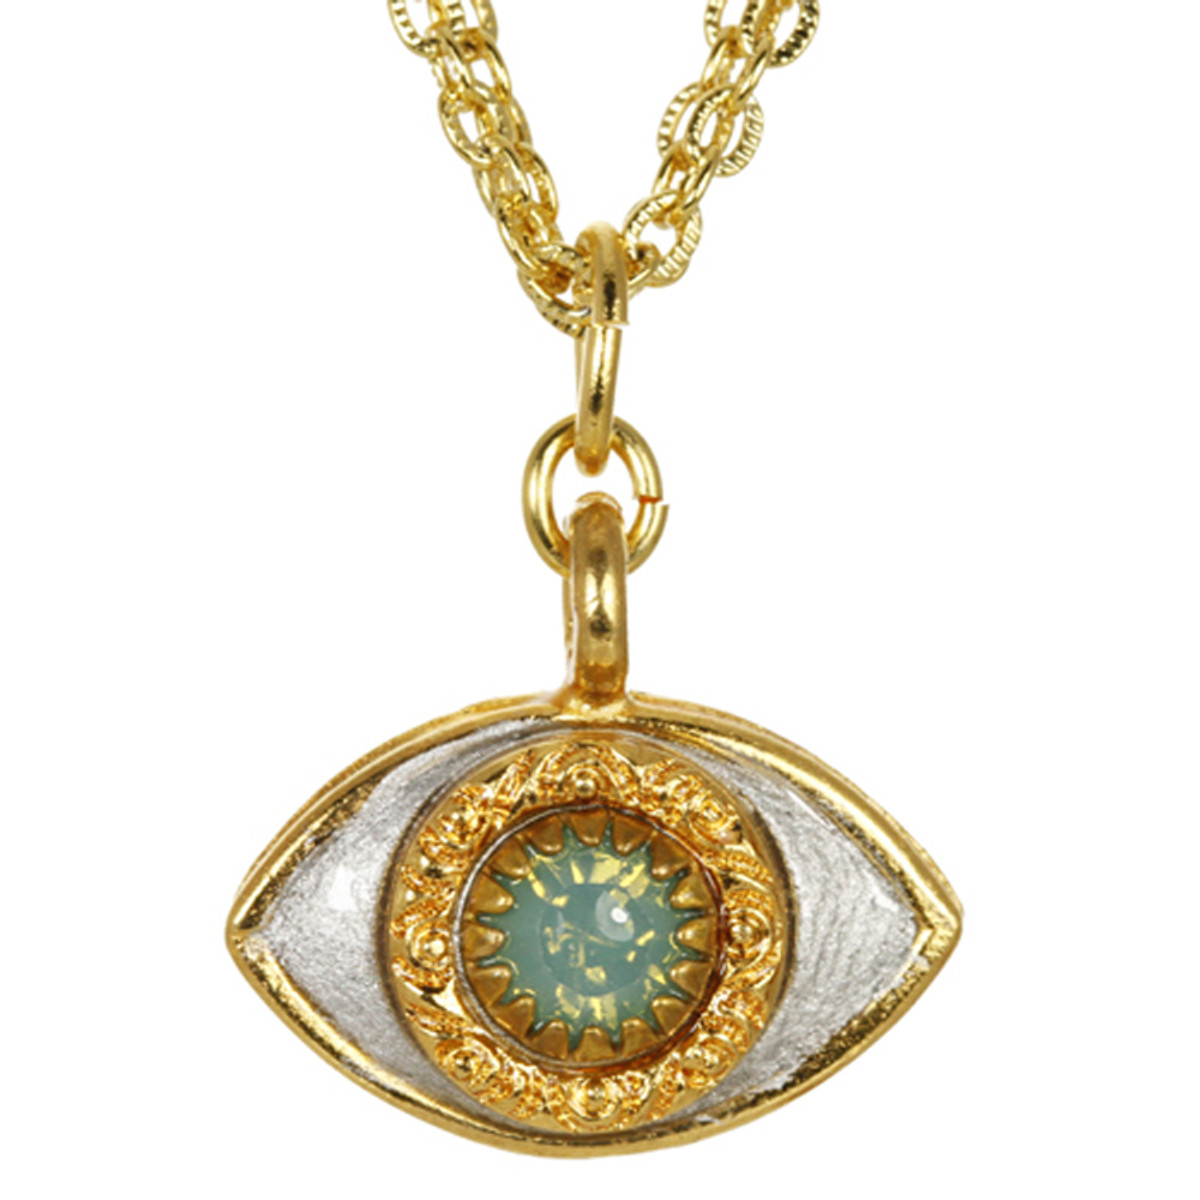 Evil Eye Necklace - Michal Golan Medium, Gray Eye With Aqua Crystal Center On Three Stranded Chain